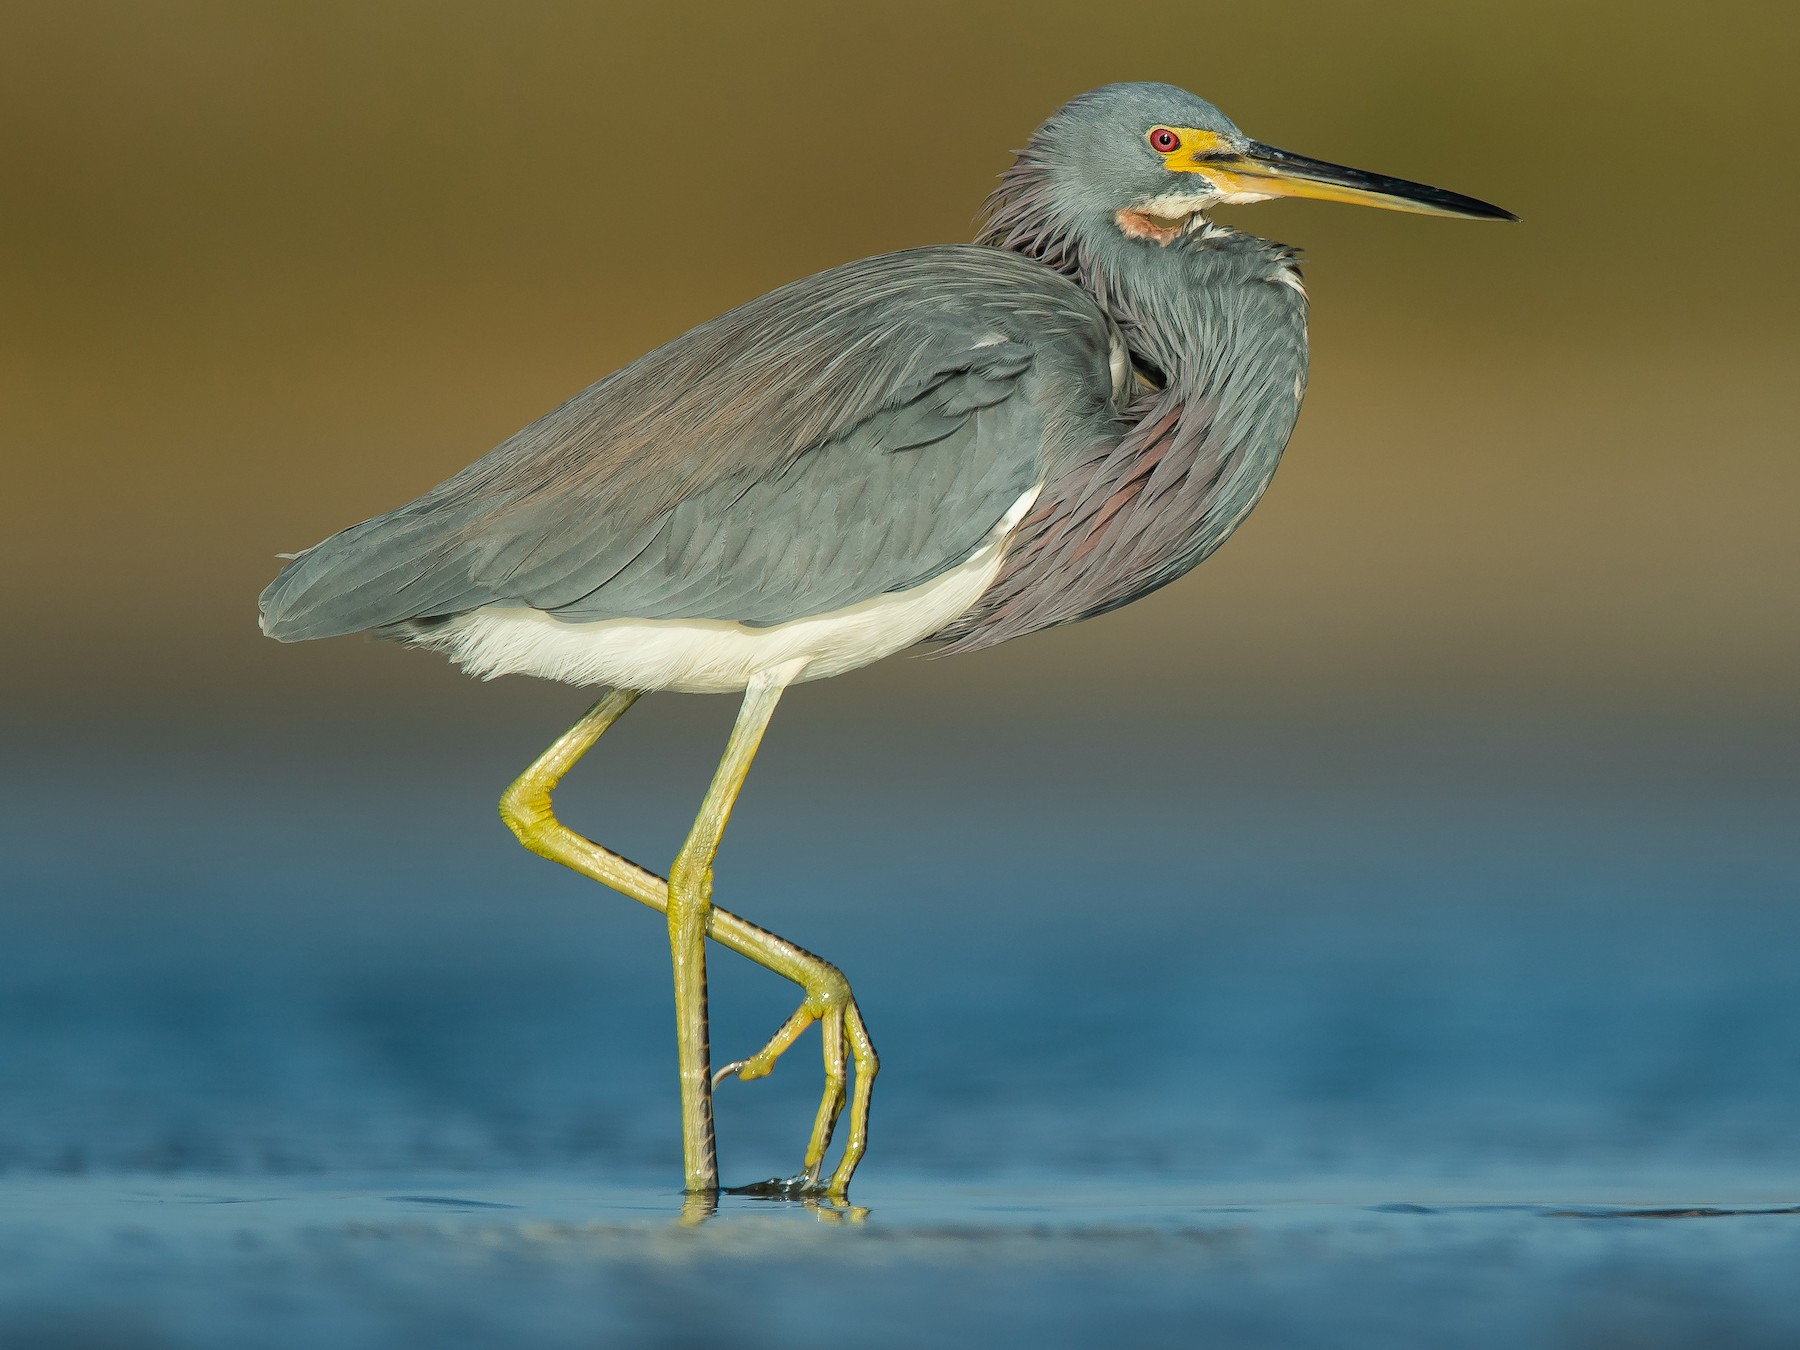 Tricolored Heron - Dorian Anderson